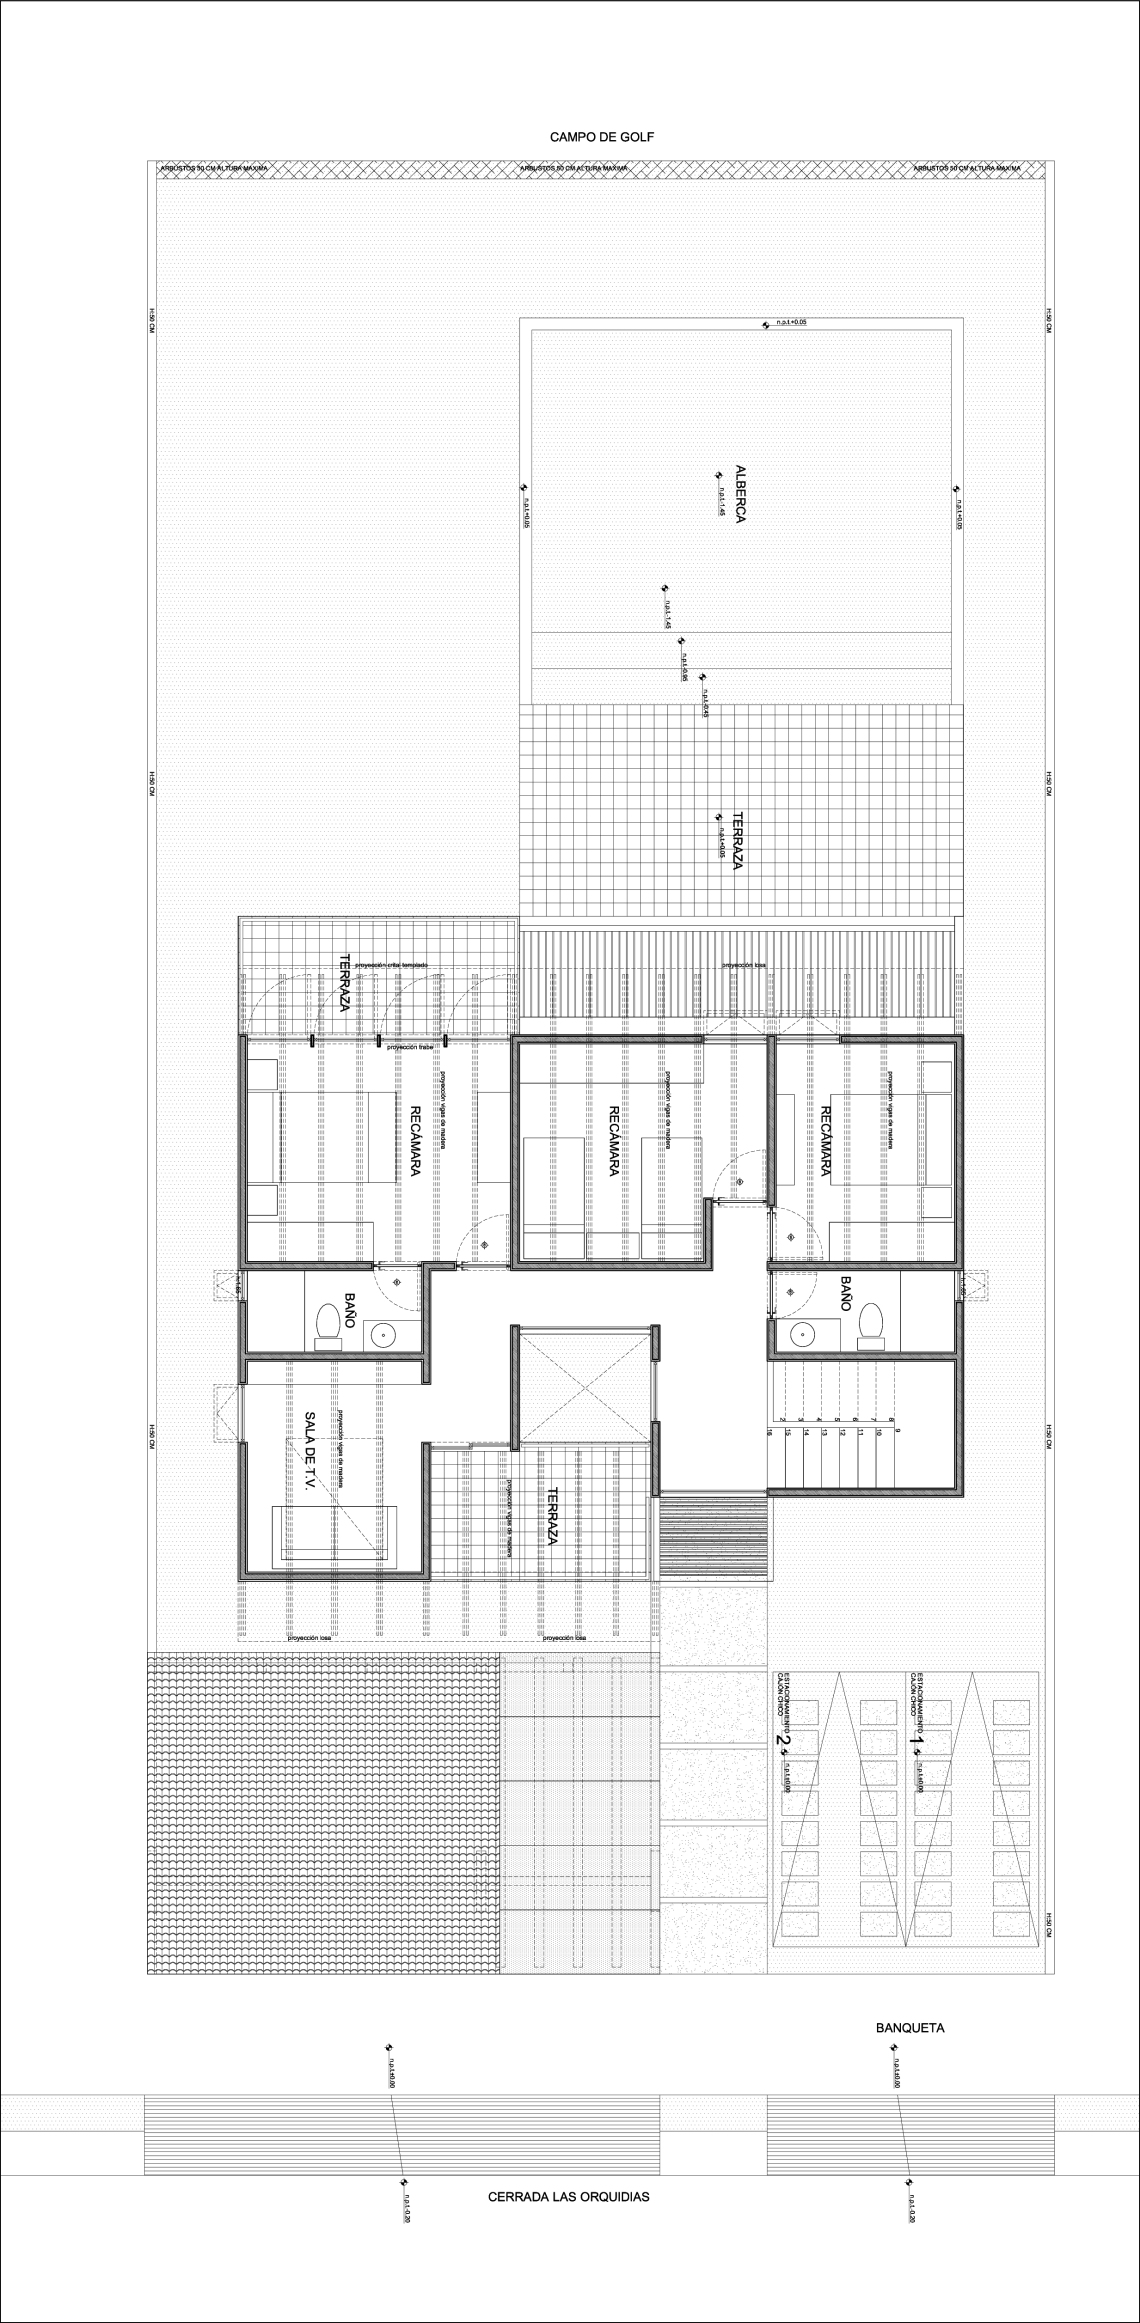 C:UsersAlfredo NaderDocuments2Goo ArquitectosGOO 2013HABI